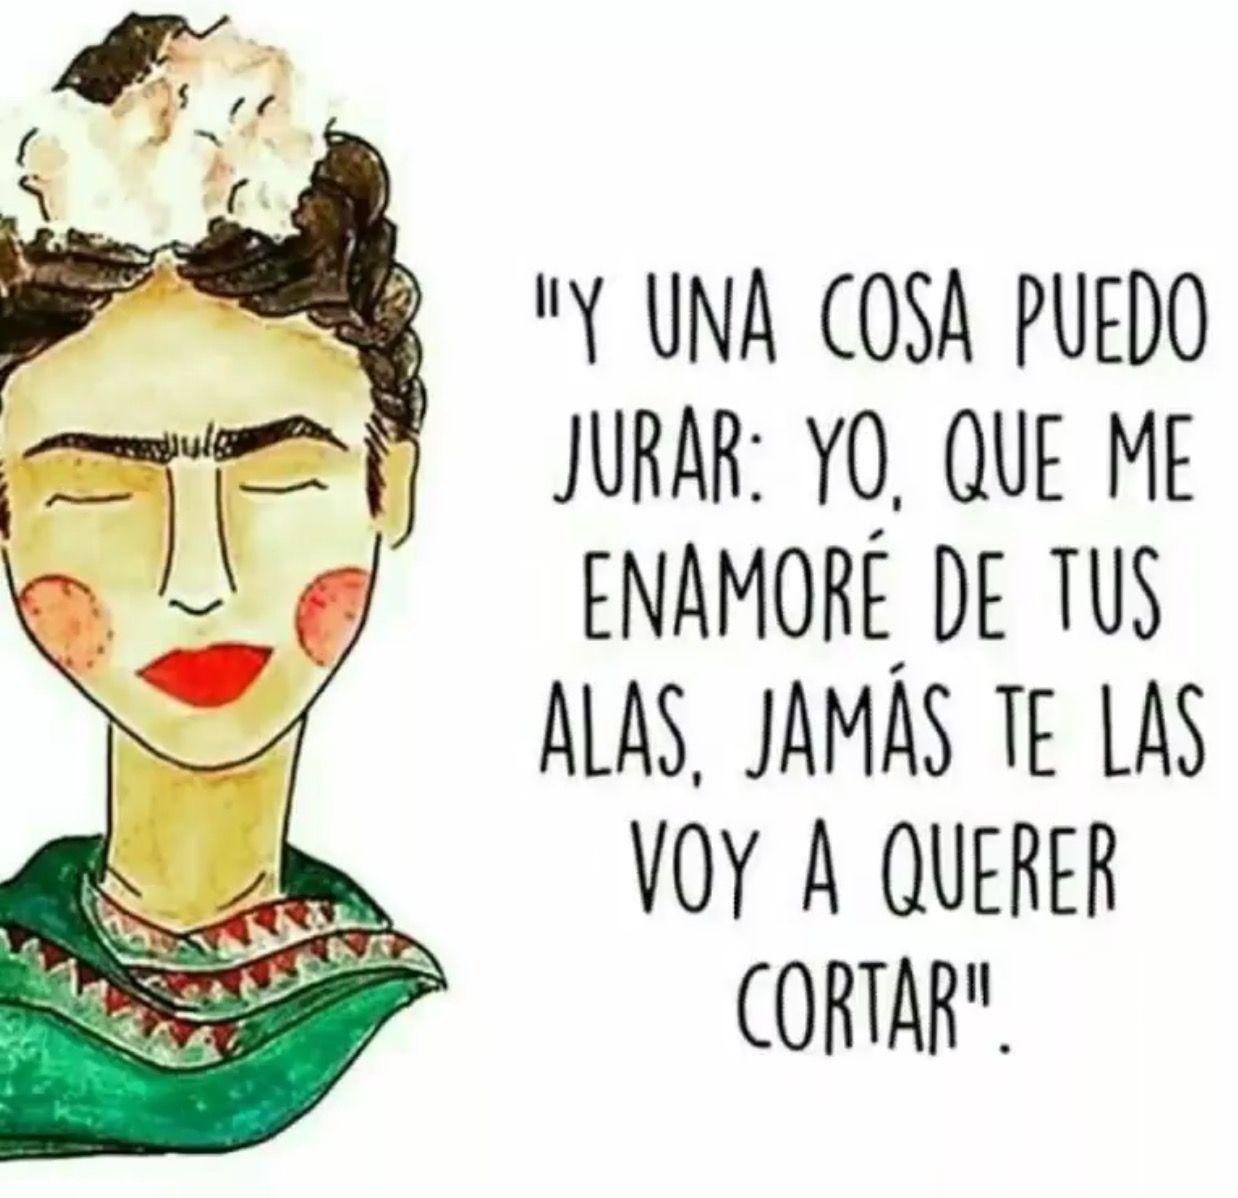 Pin von Maria del Carmen almeida correa auf Amo Frida !   Pinterest